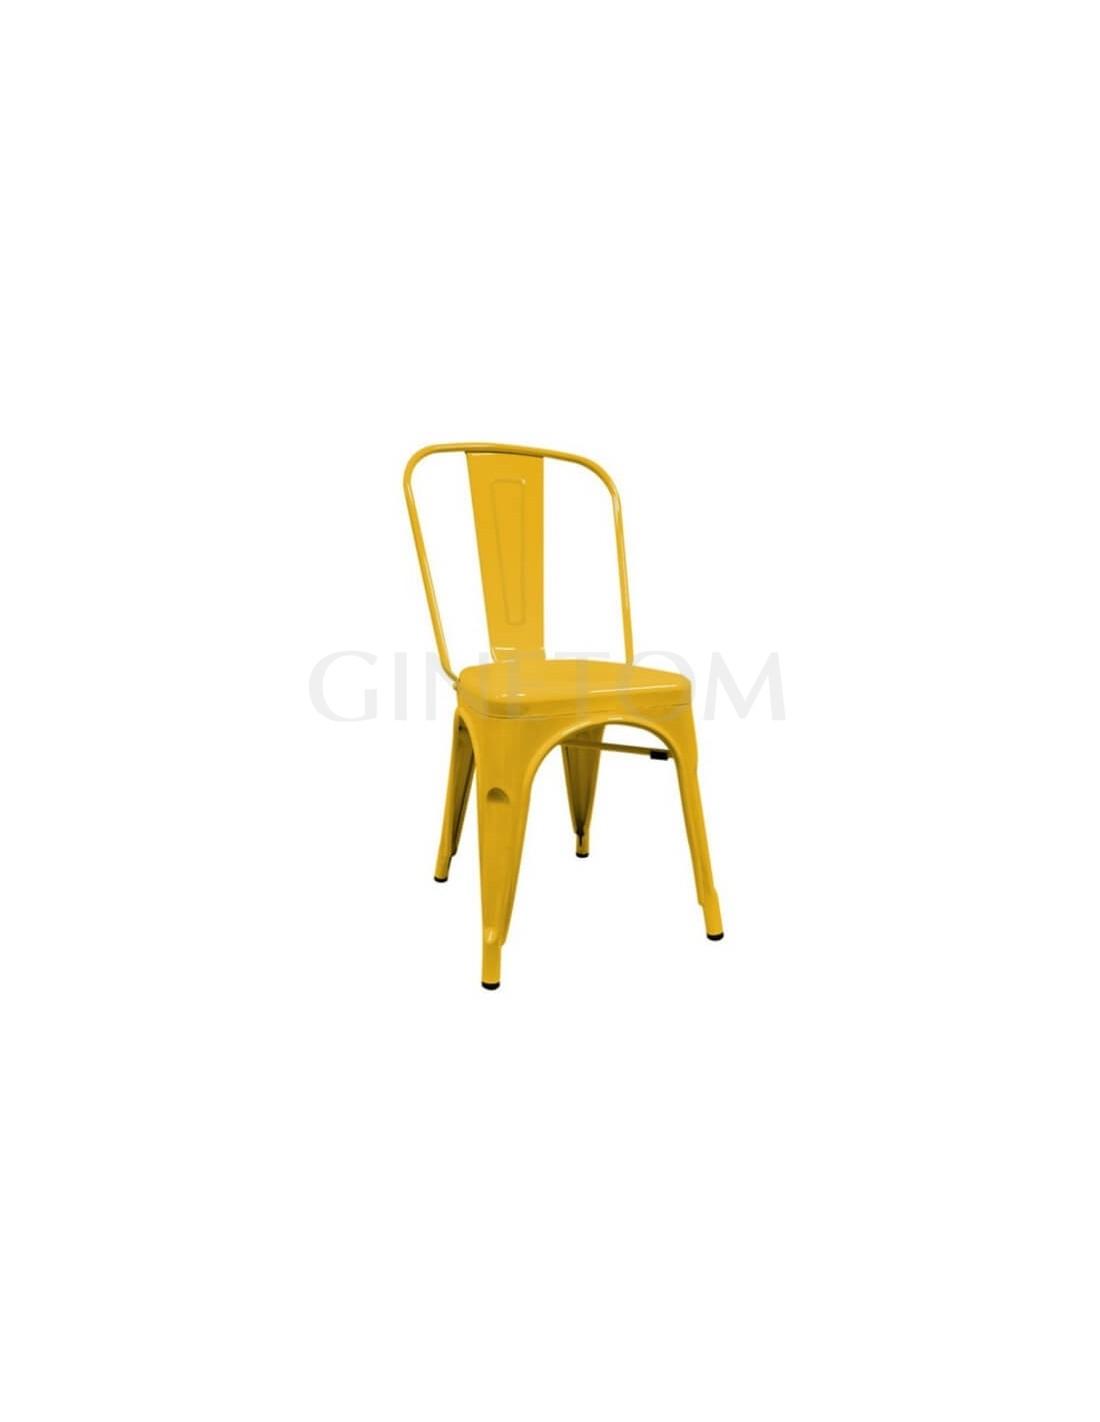 Silla hosteleria tolix replica mobiliario para hosteleria - Silla tolix ...